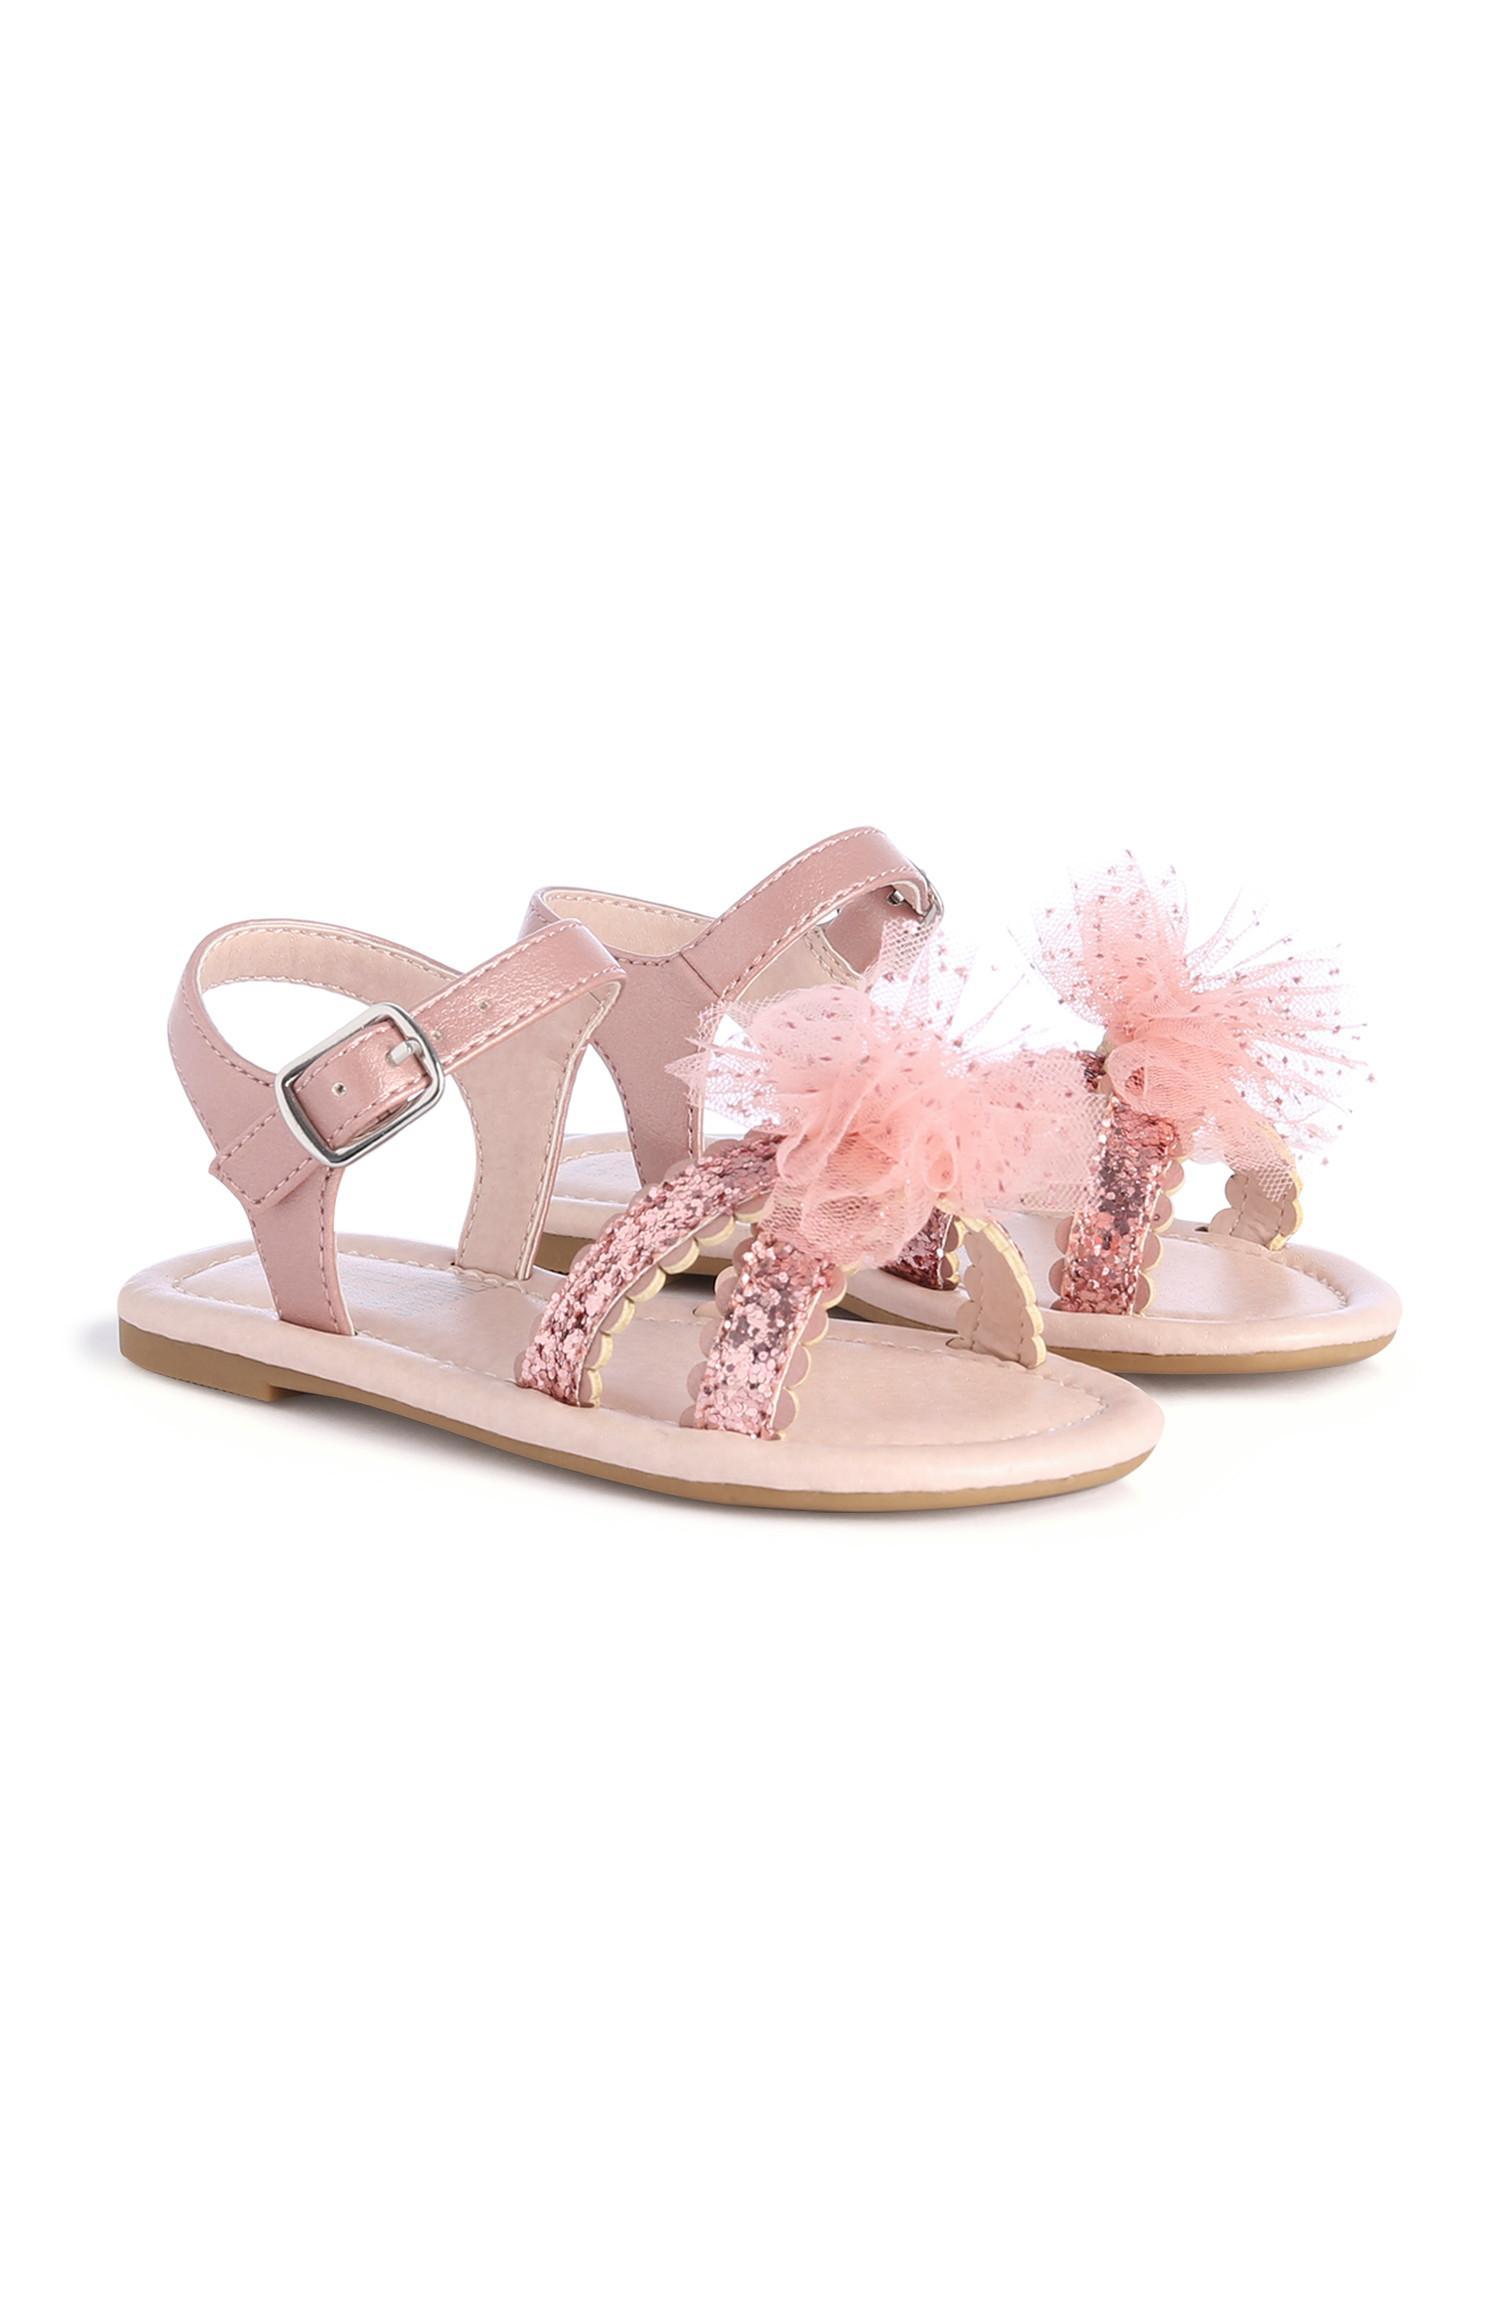 Younger Girl Pink Sandal